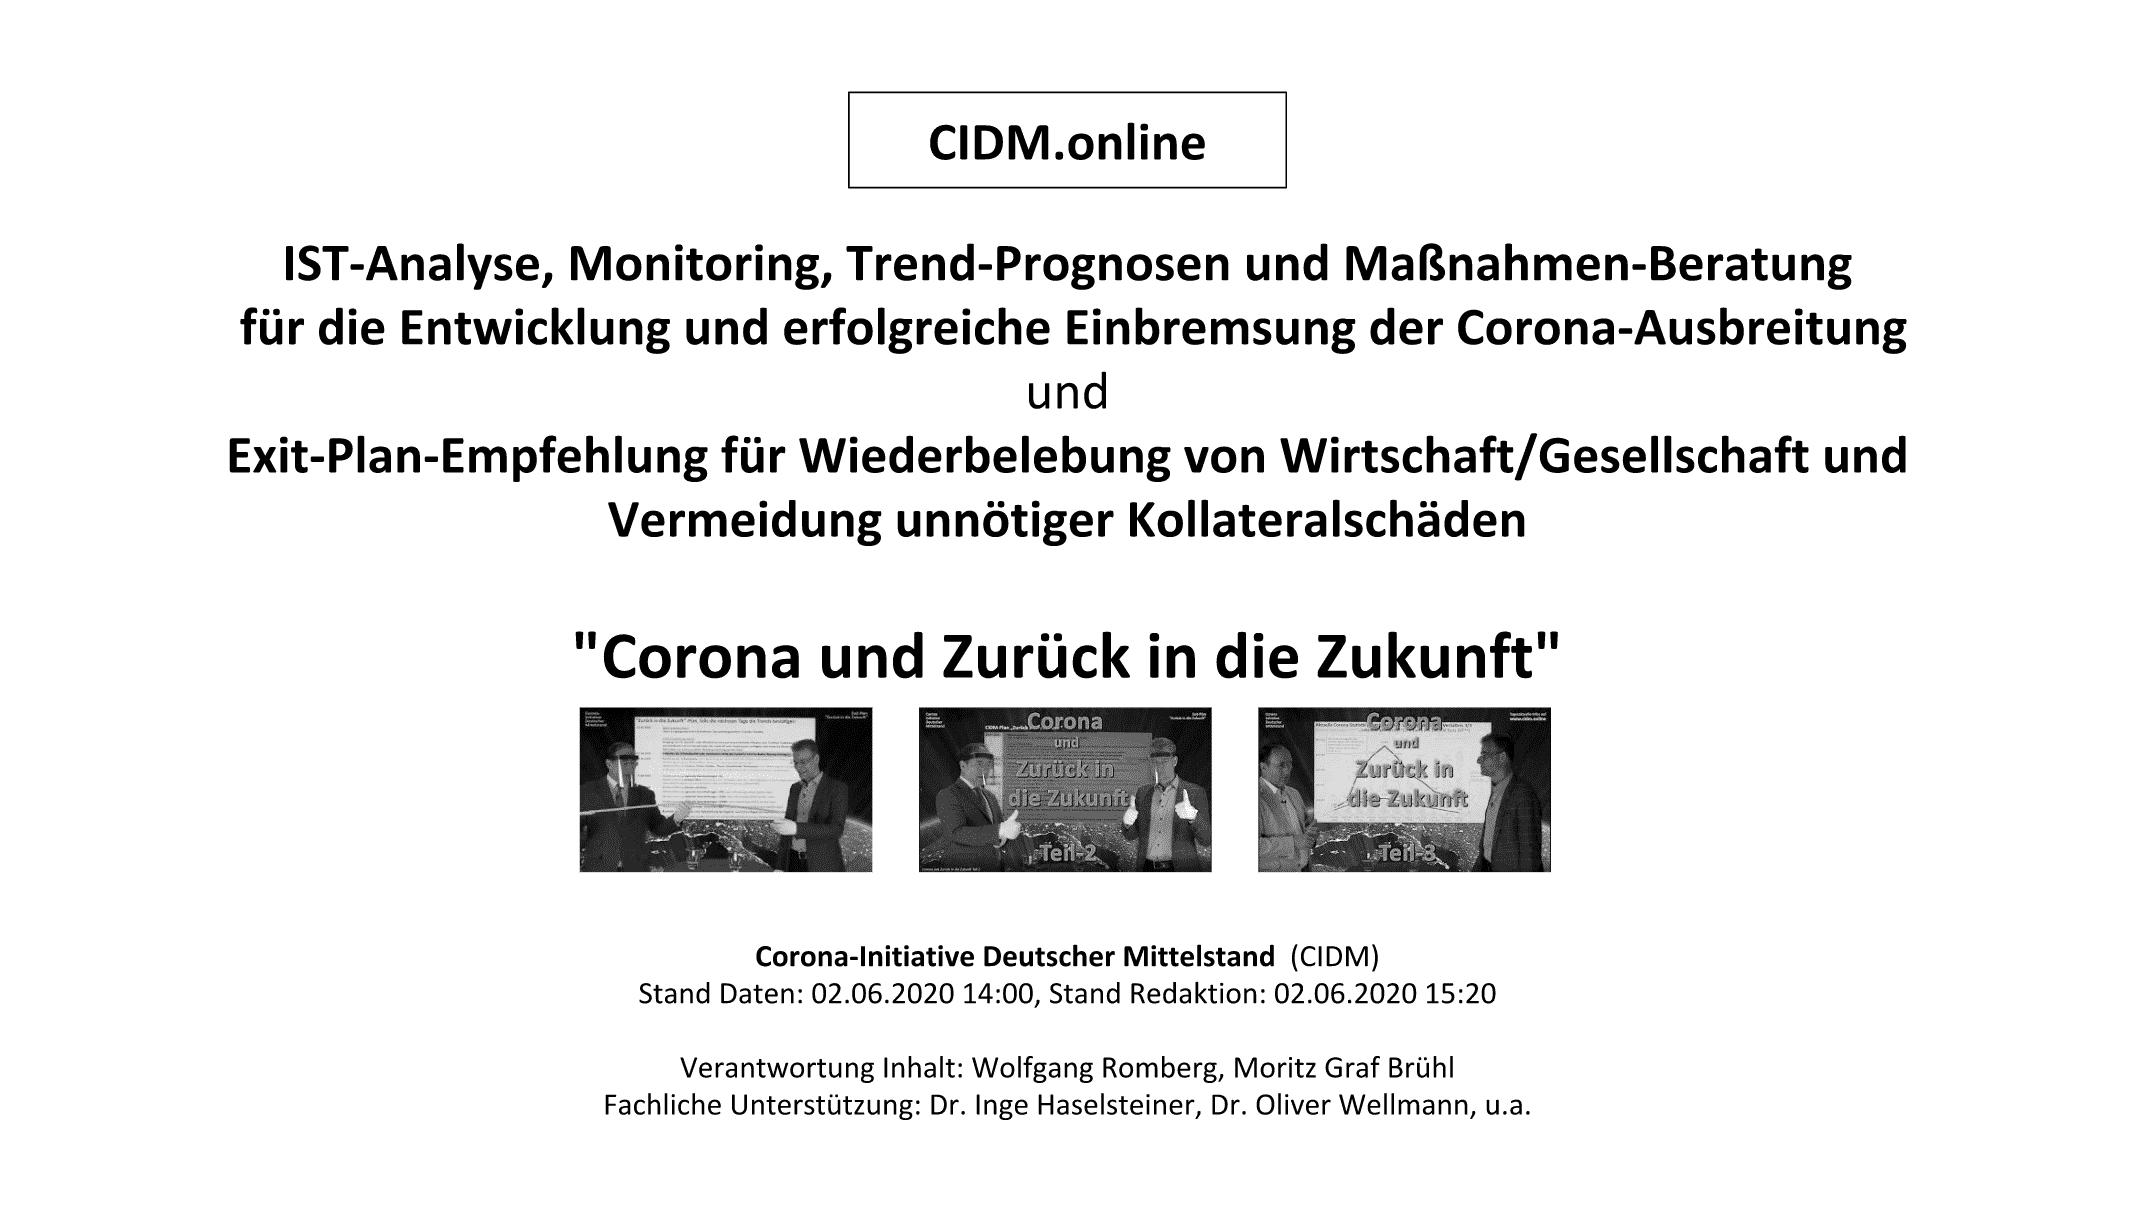 CIDM.online